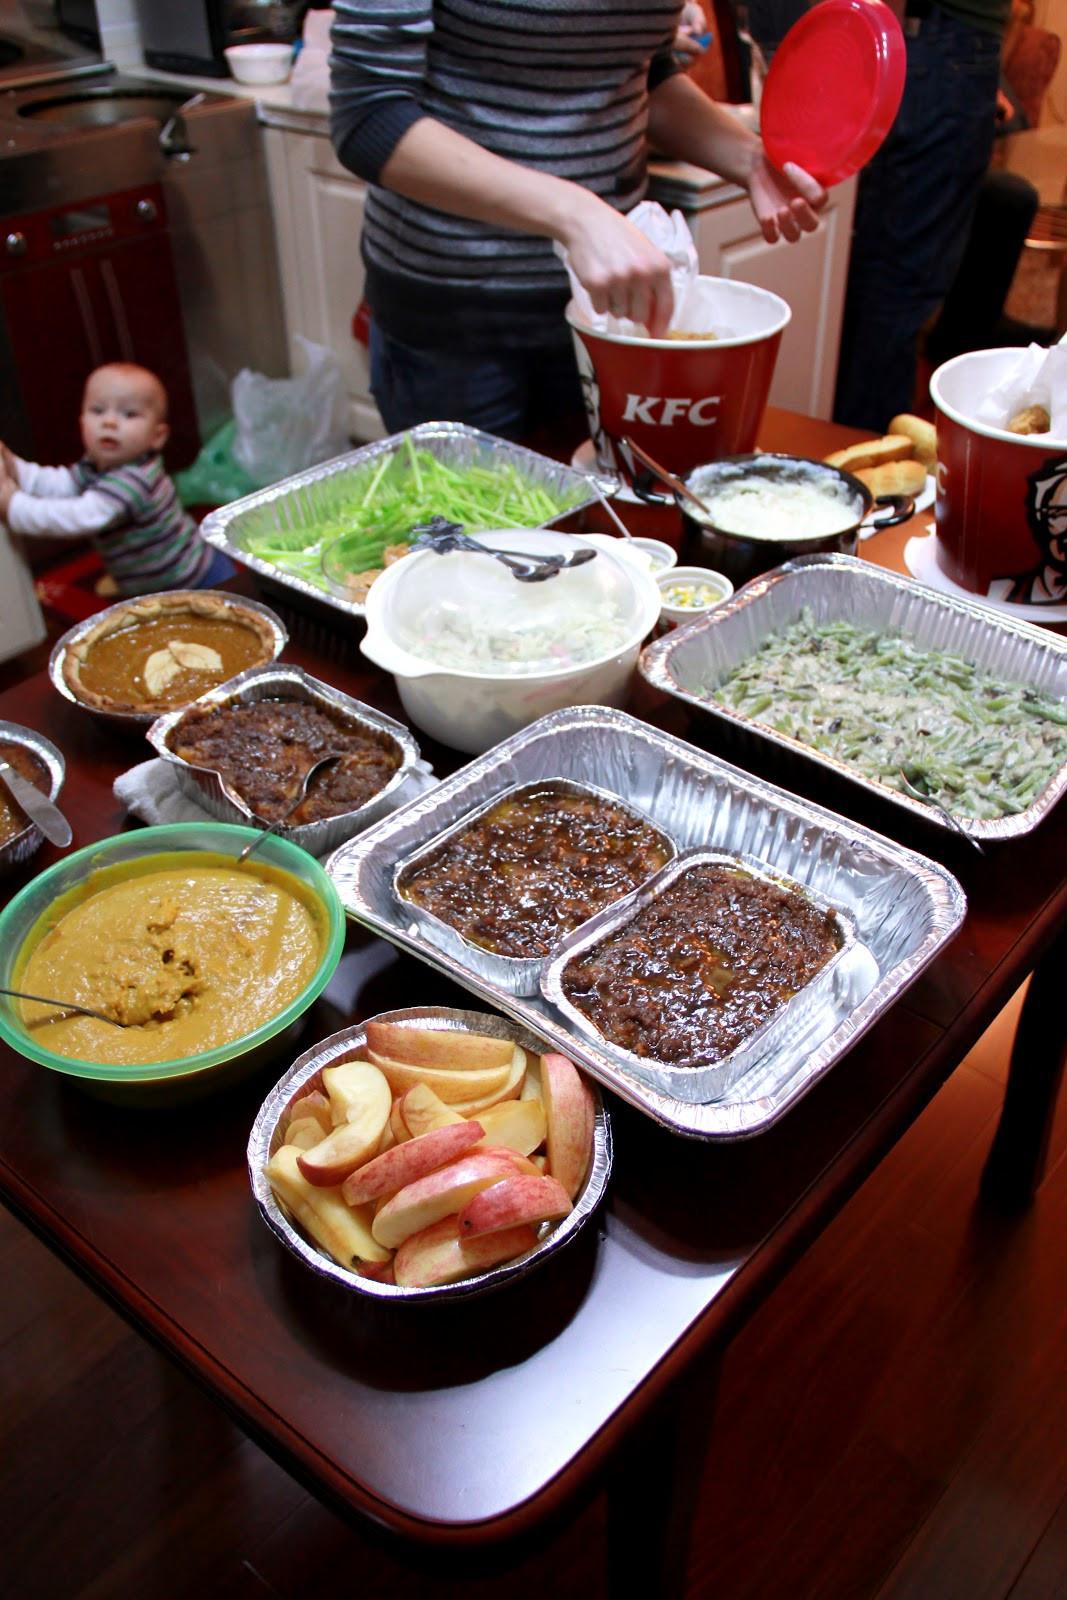 Kfc Thanksgiving Turkey  The Bowen Buzz Adventures of Us Happy Thanksgiving Pass